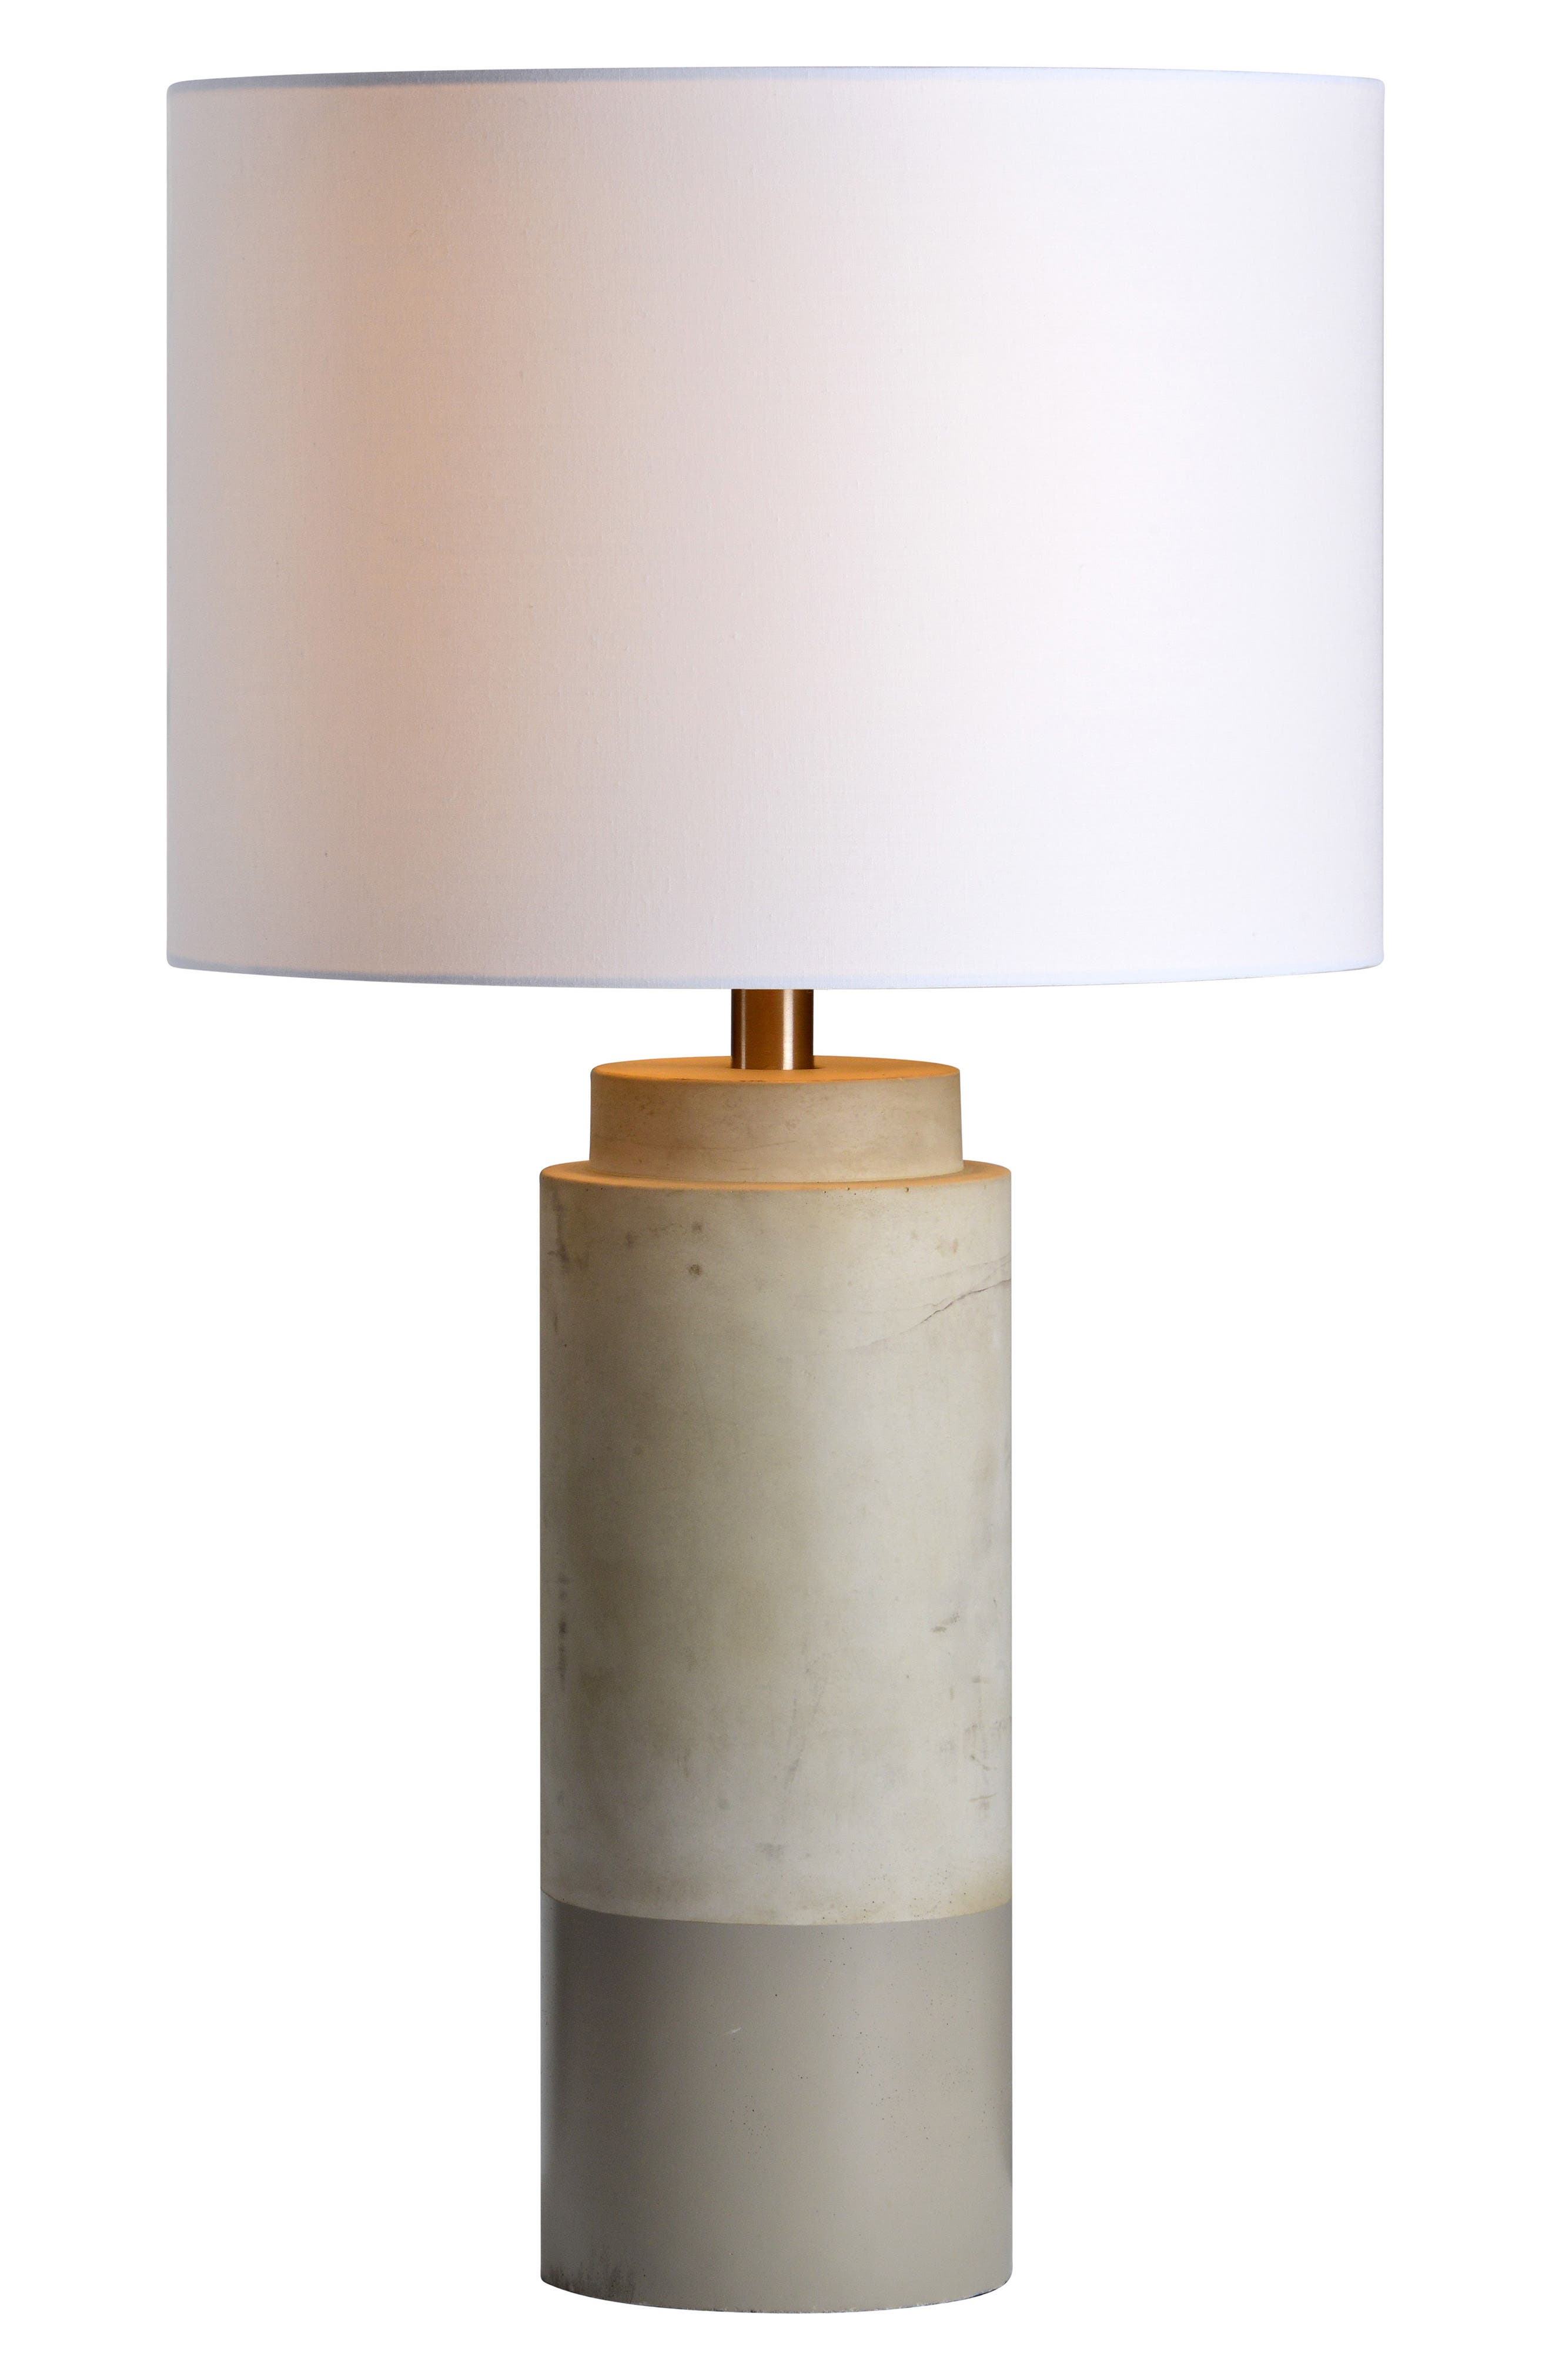 Lagertha Table Lamp,                             Main thumbnail 1, color,                             200